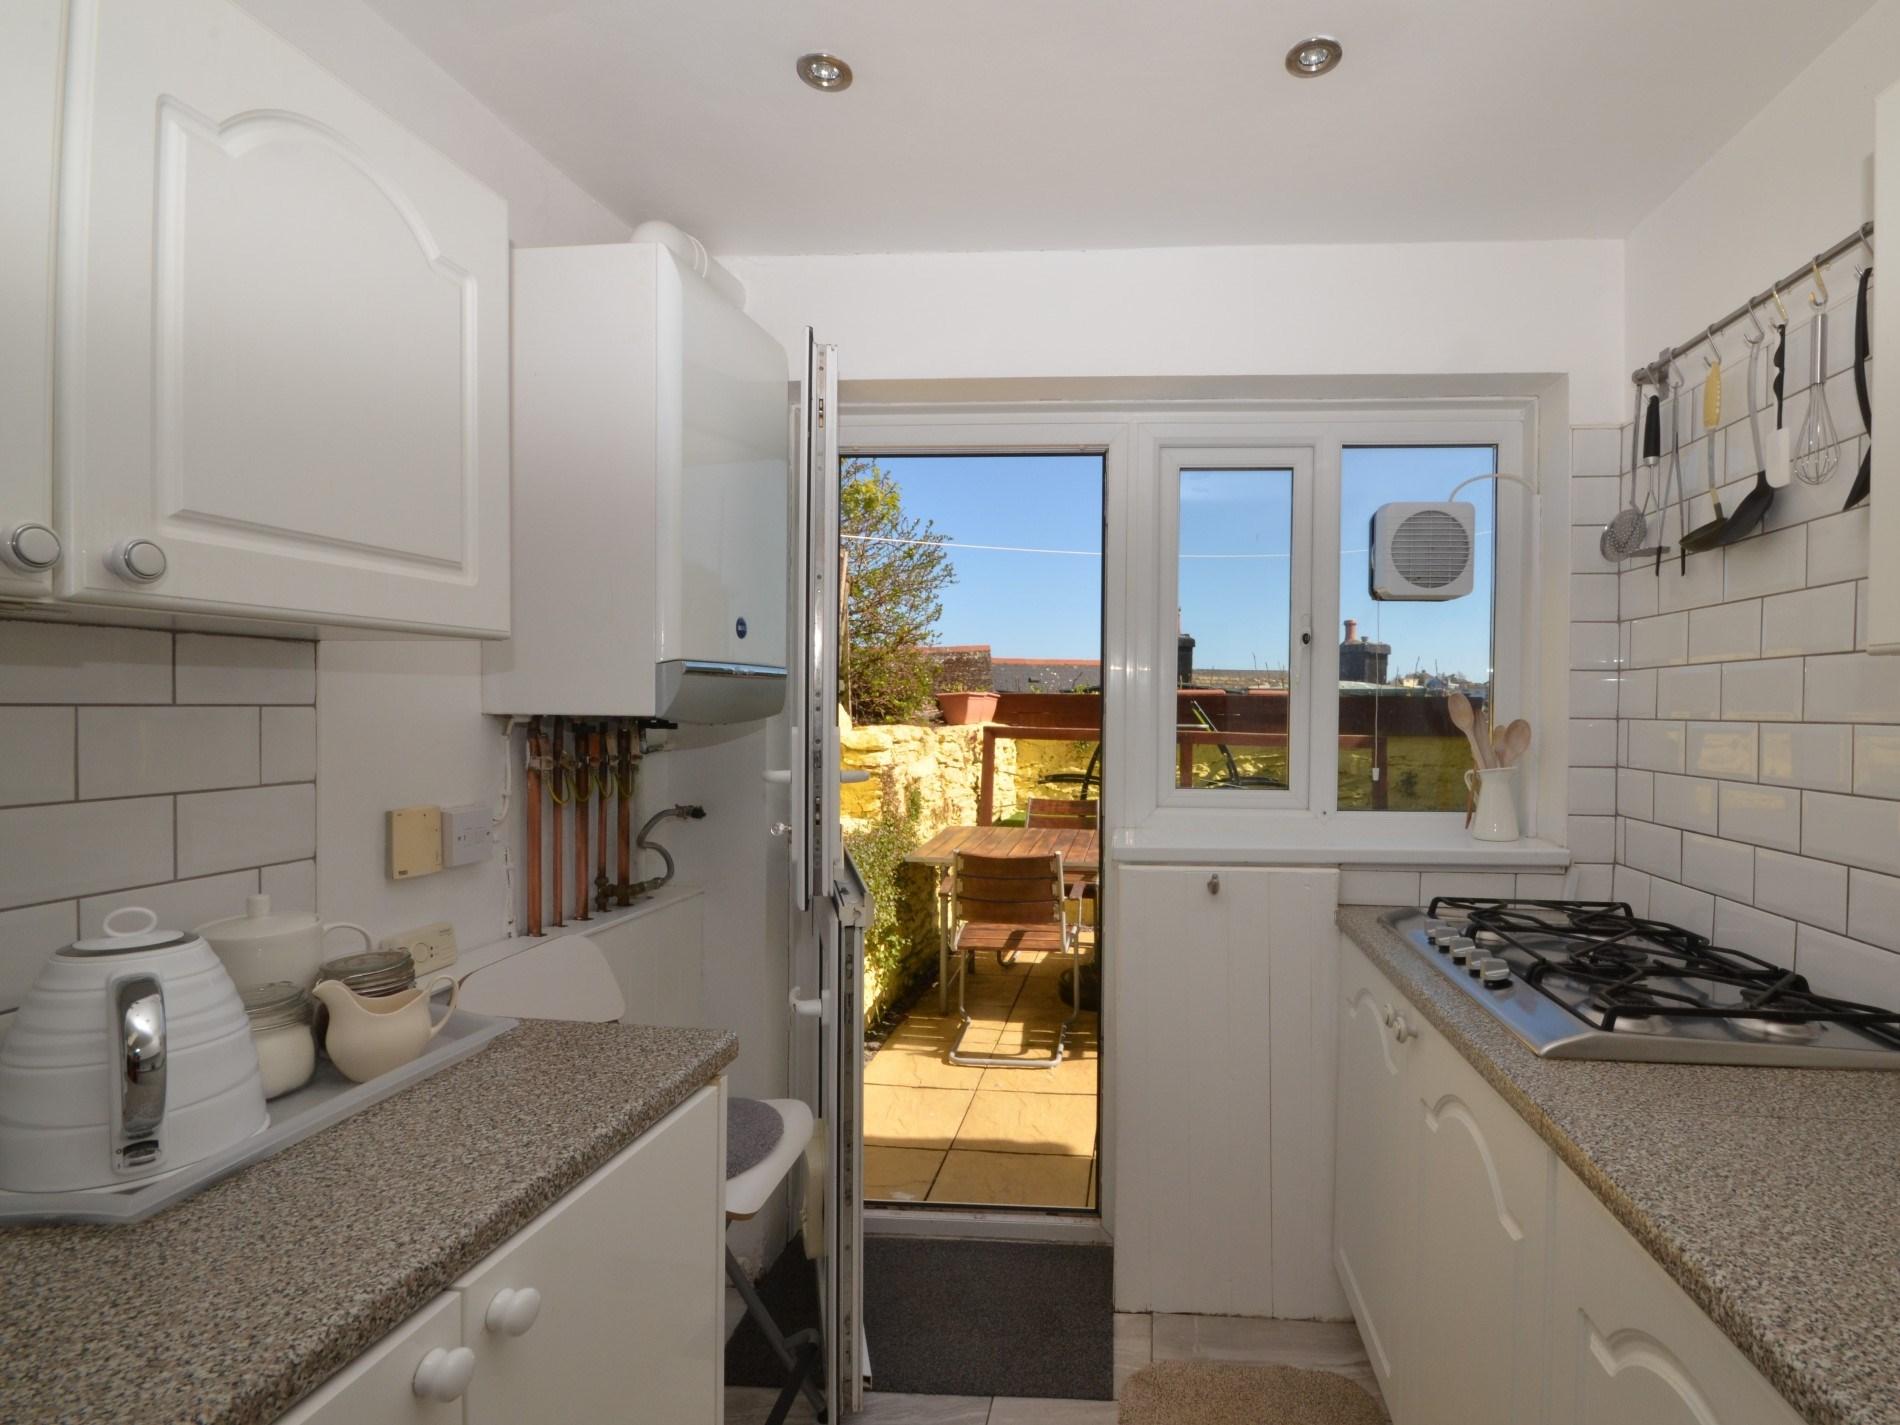 1 Bedroom House in South Devon, Devon